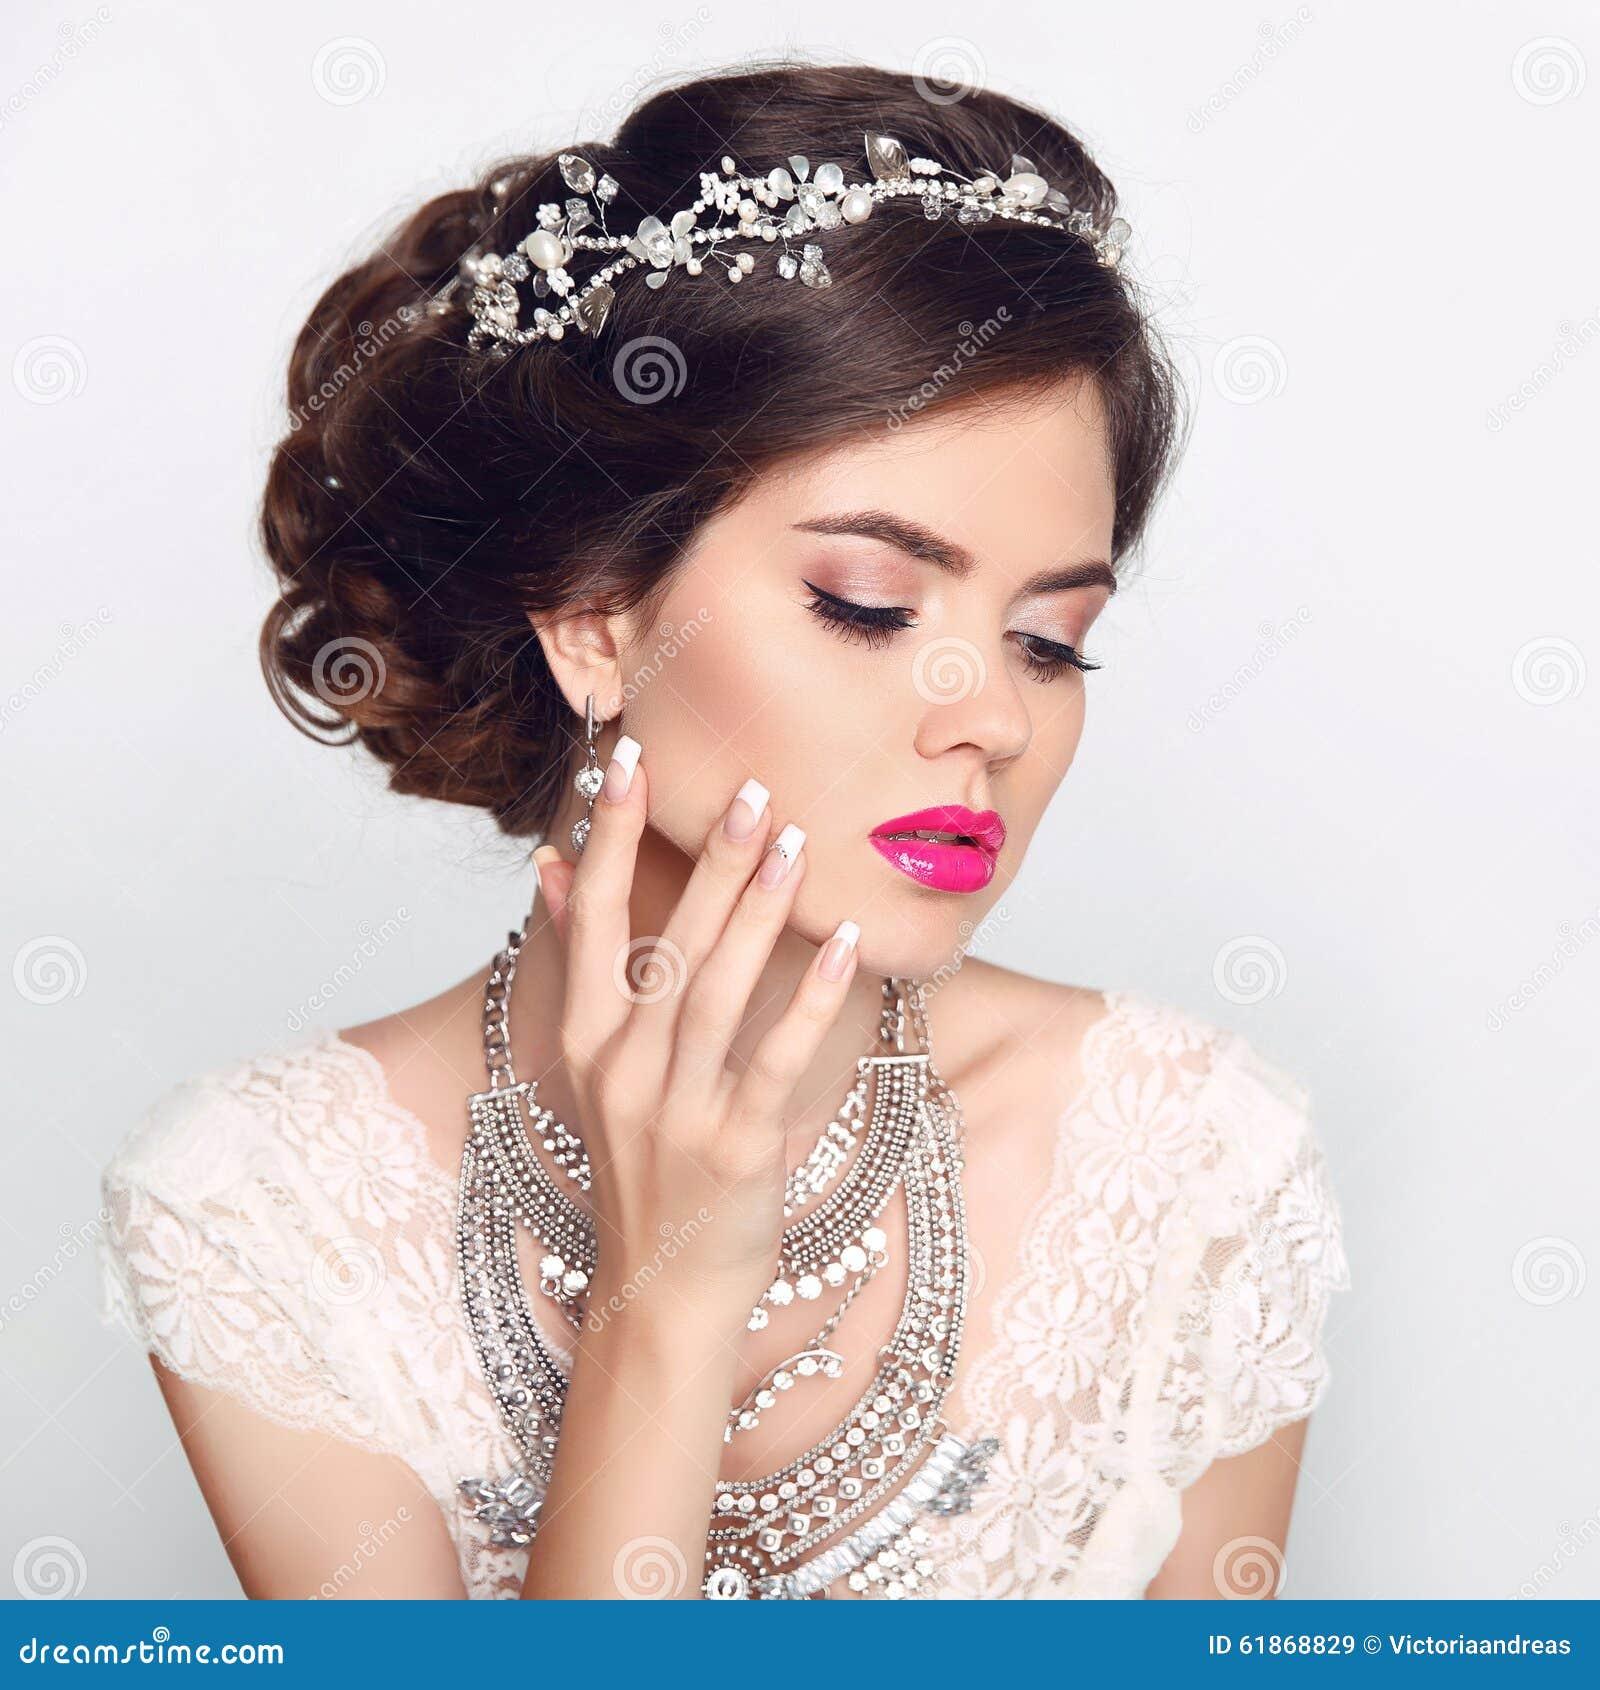 Beauty Fashion Model Girl With Wedding Elegant Hairstyle